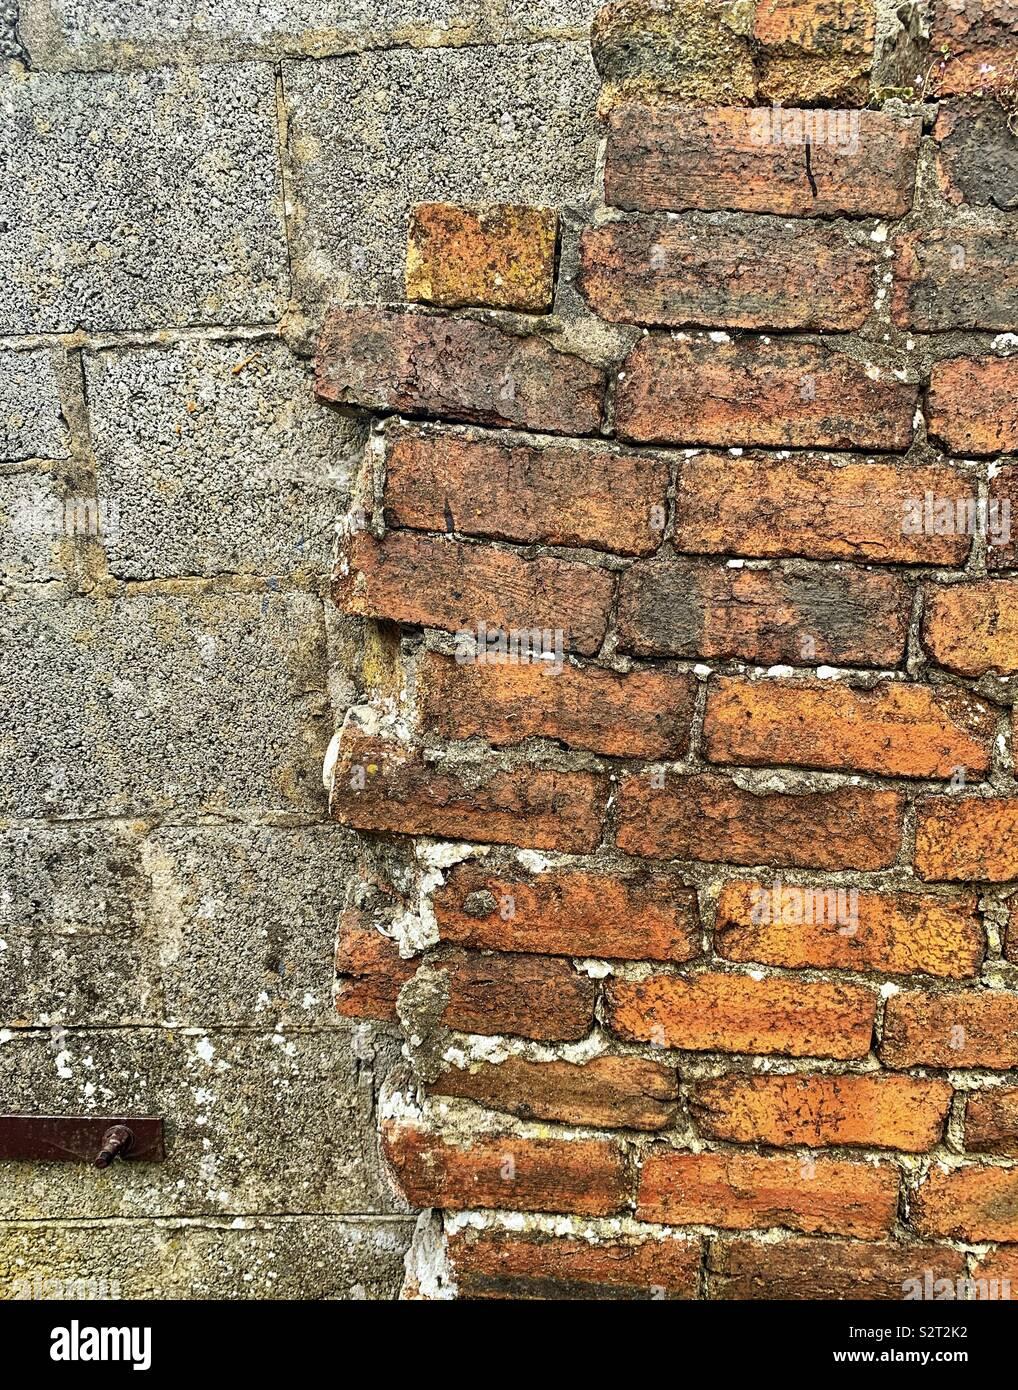 Half demolished brick wall with breeze block wall behind - Stock Image